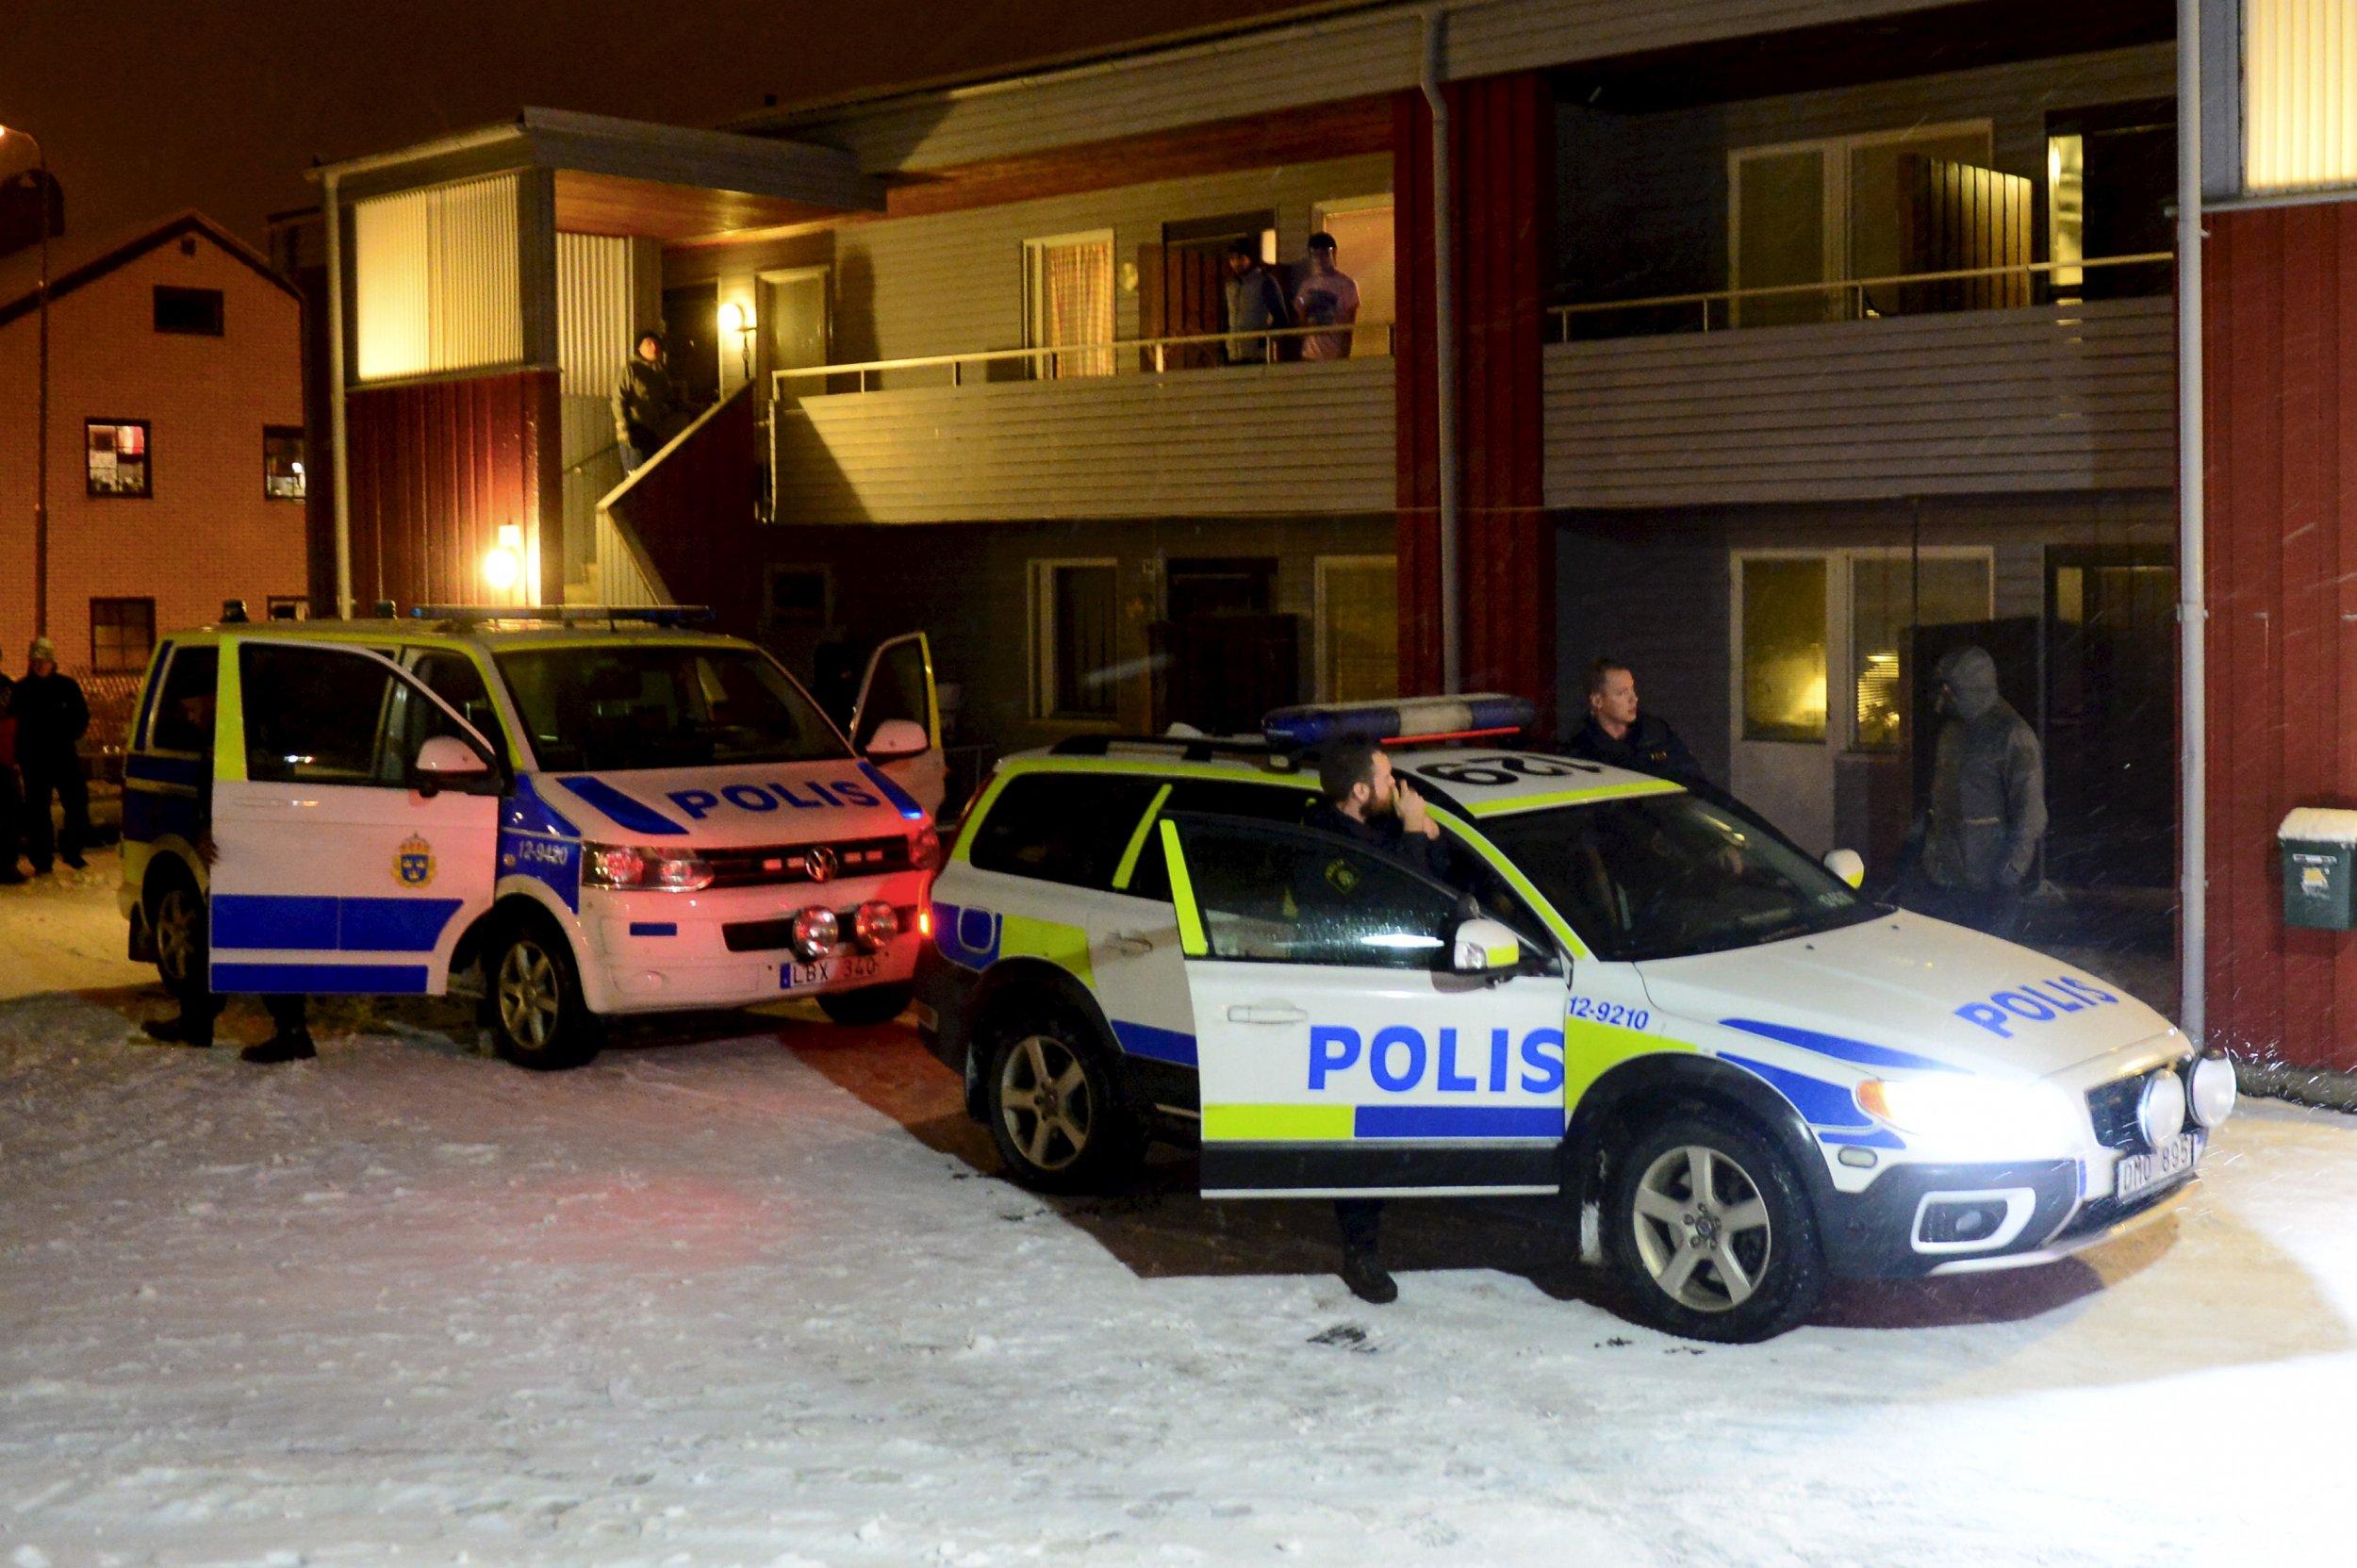 Stabbing at Swedish Asylum Center